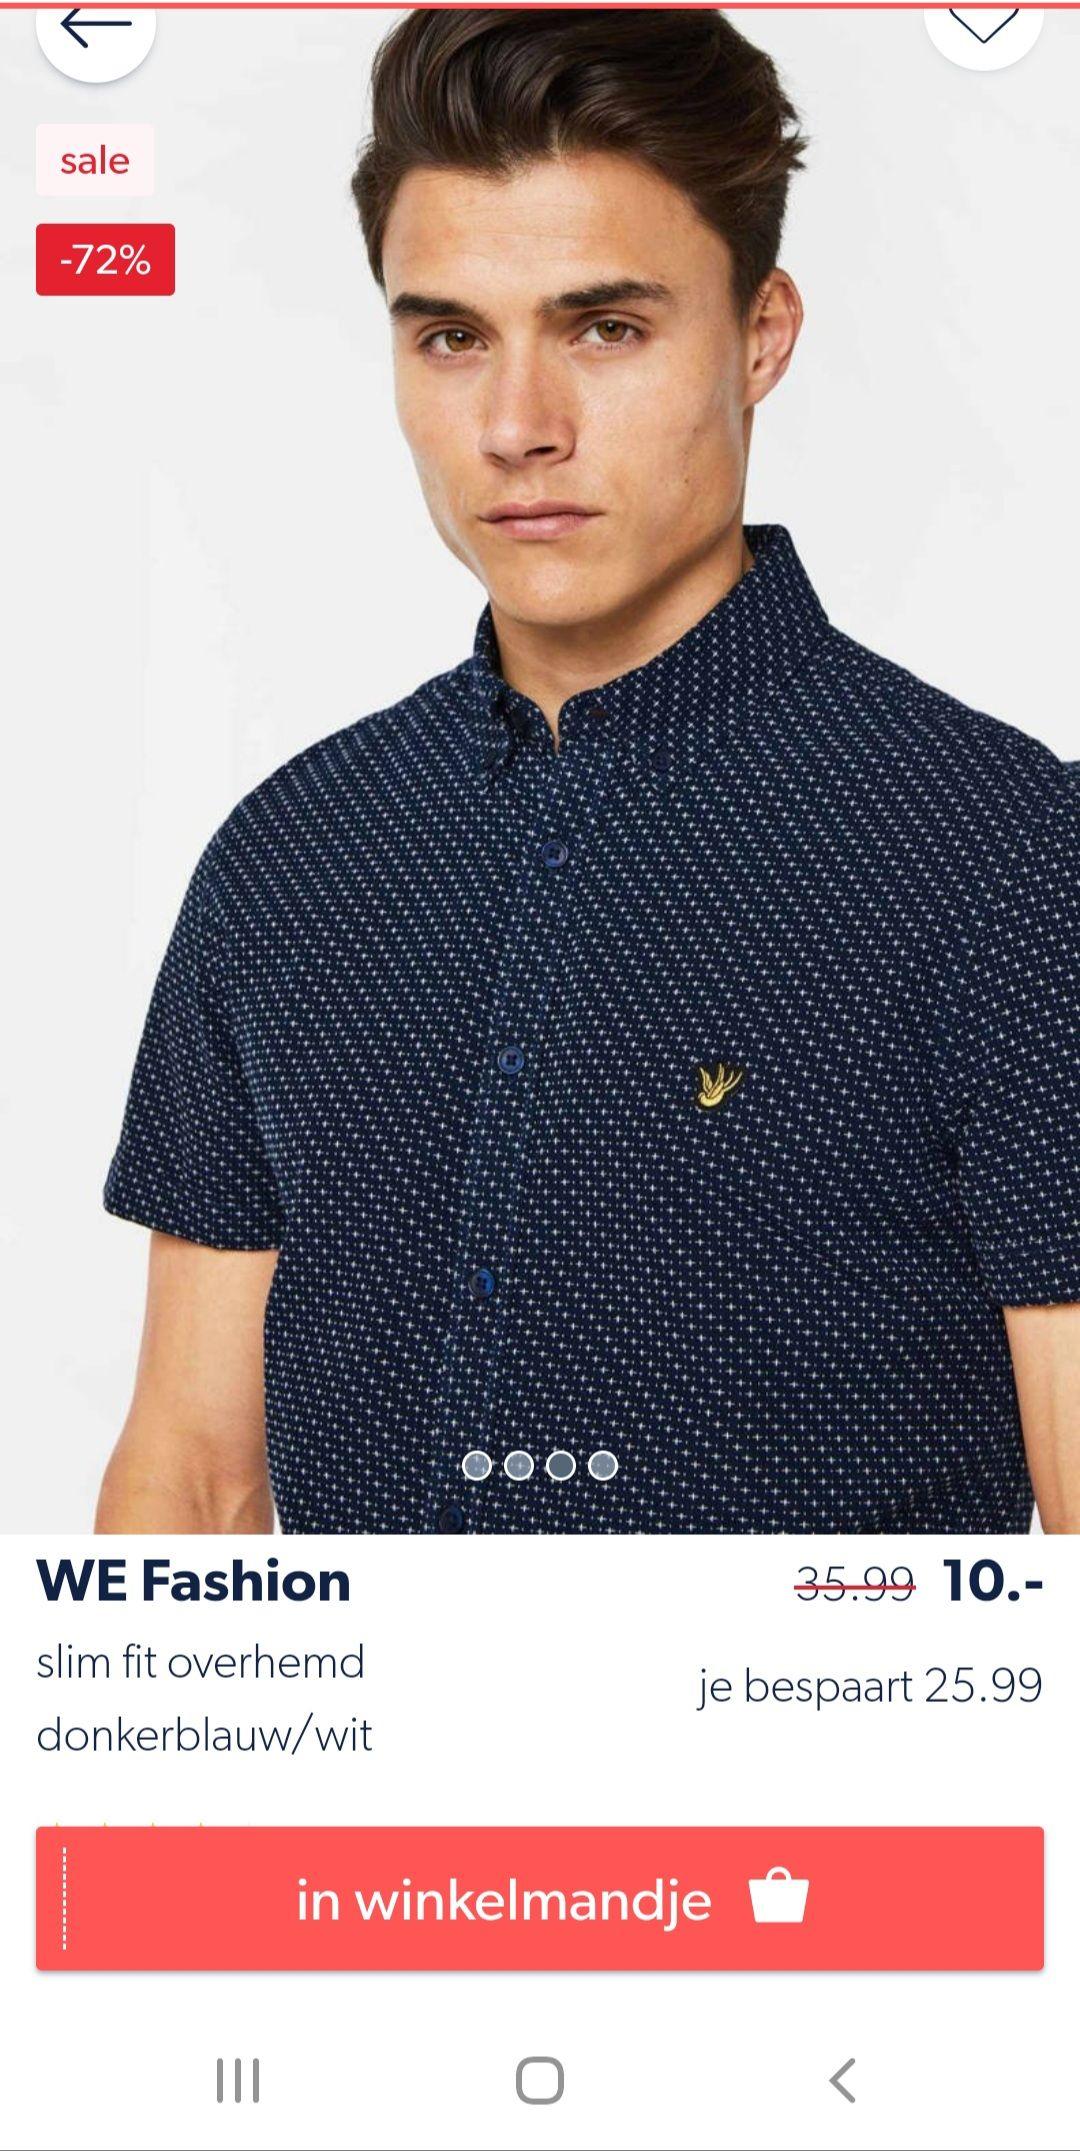 Mooie We Fashion Overhemd voor 10 euro